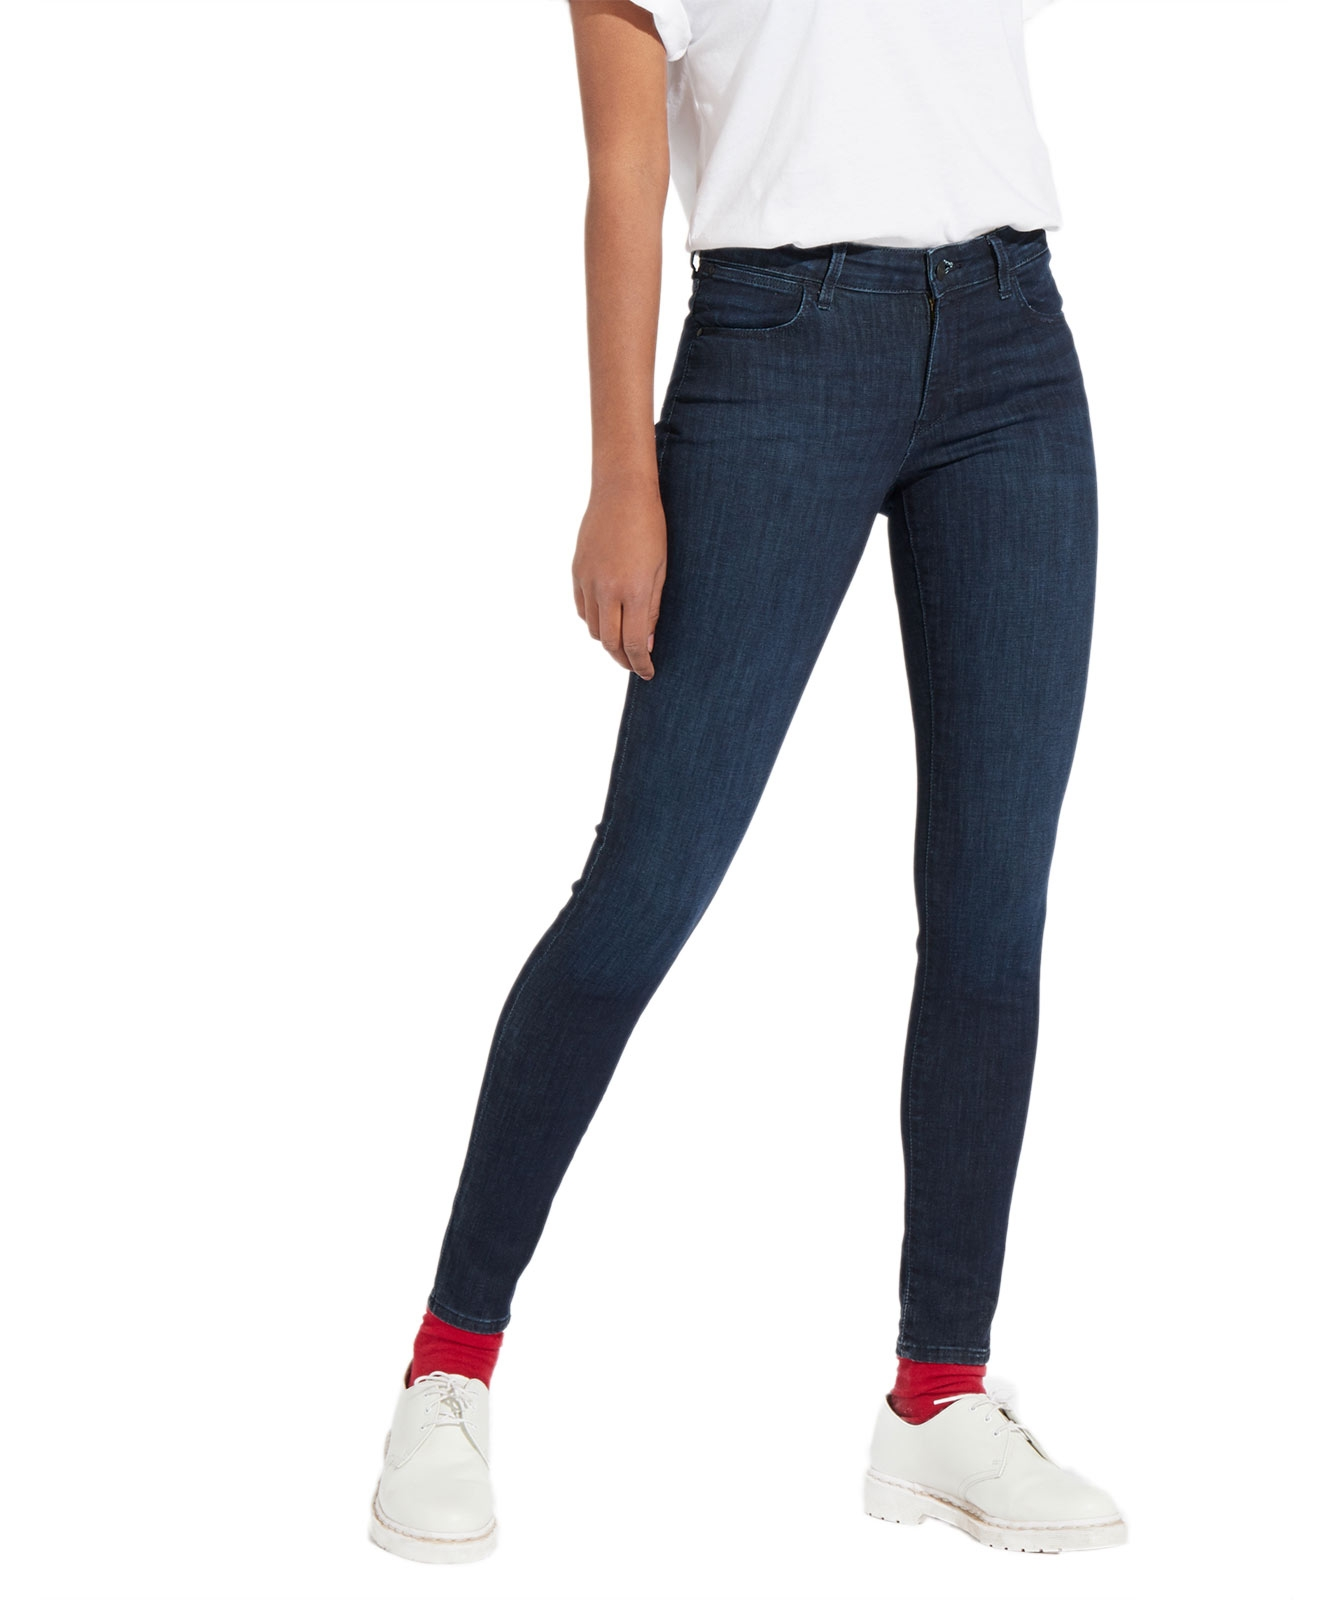 Hosen für Frauen - Wrangler Damen Jeans Skinny in Tainted Blue  - Onlineshop Jeans Meile